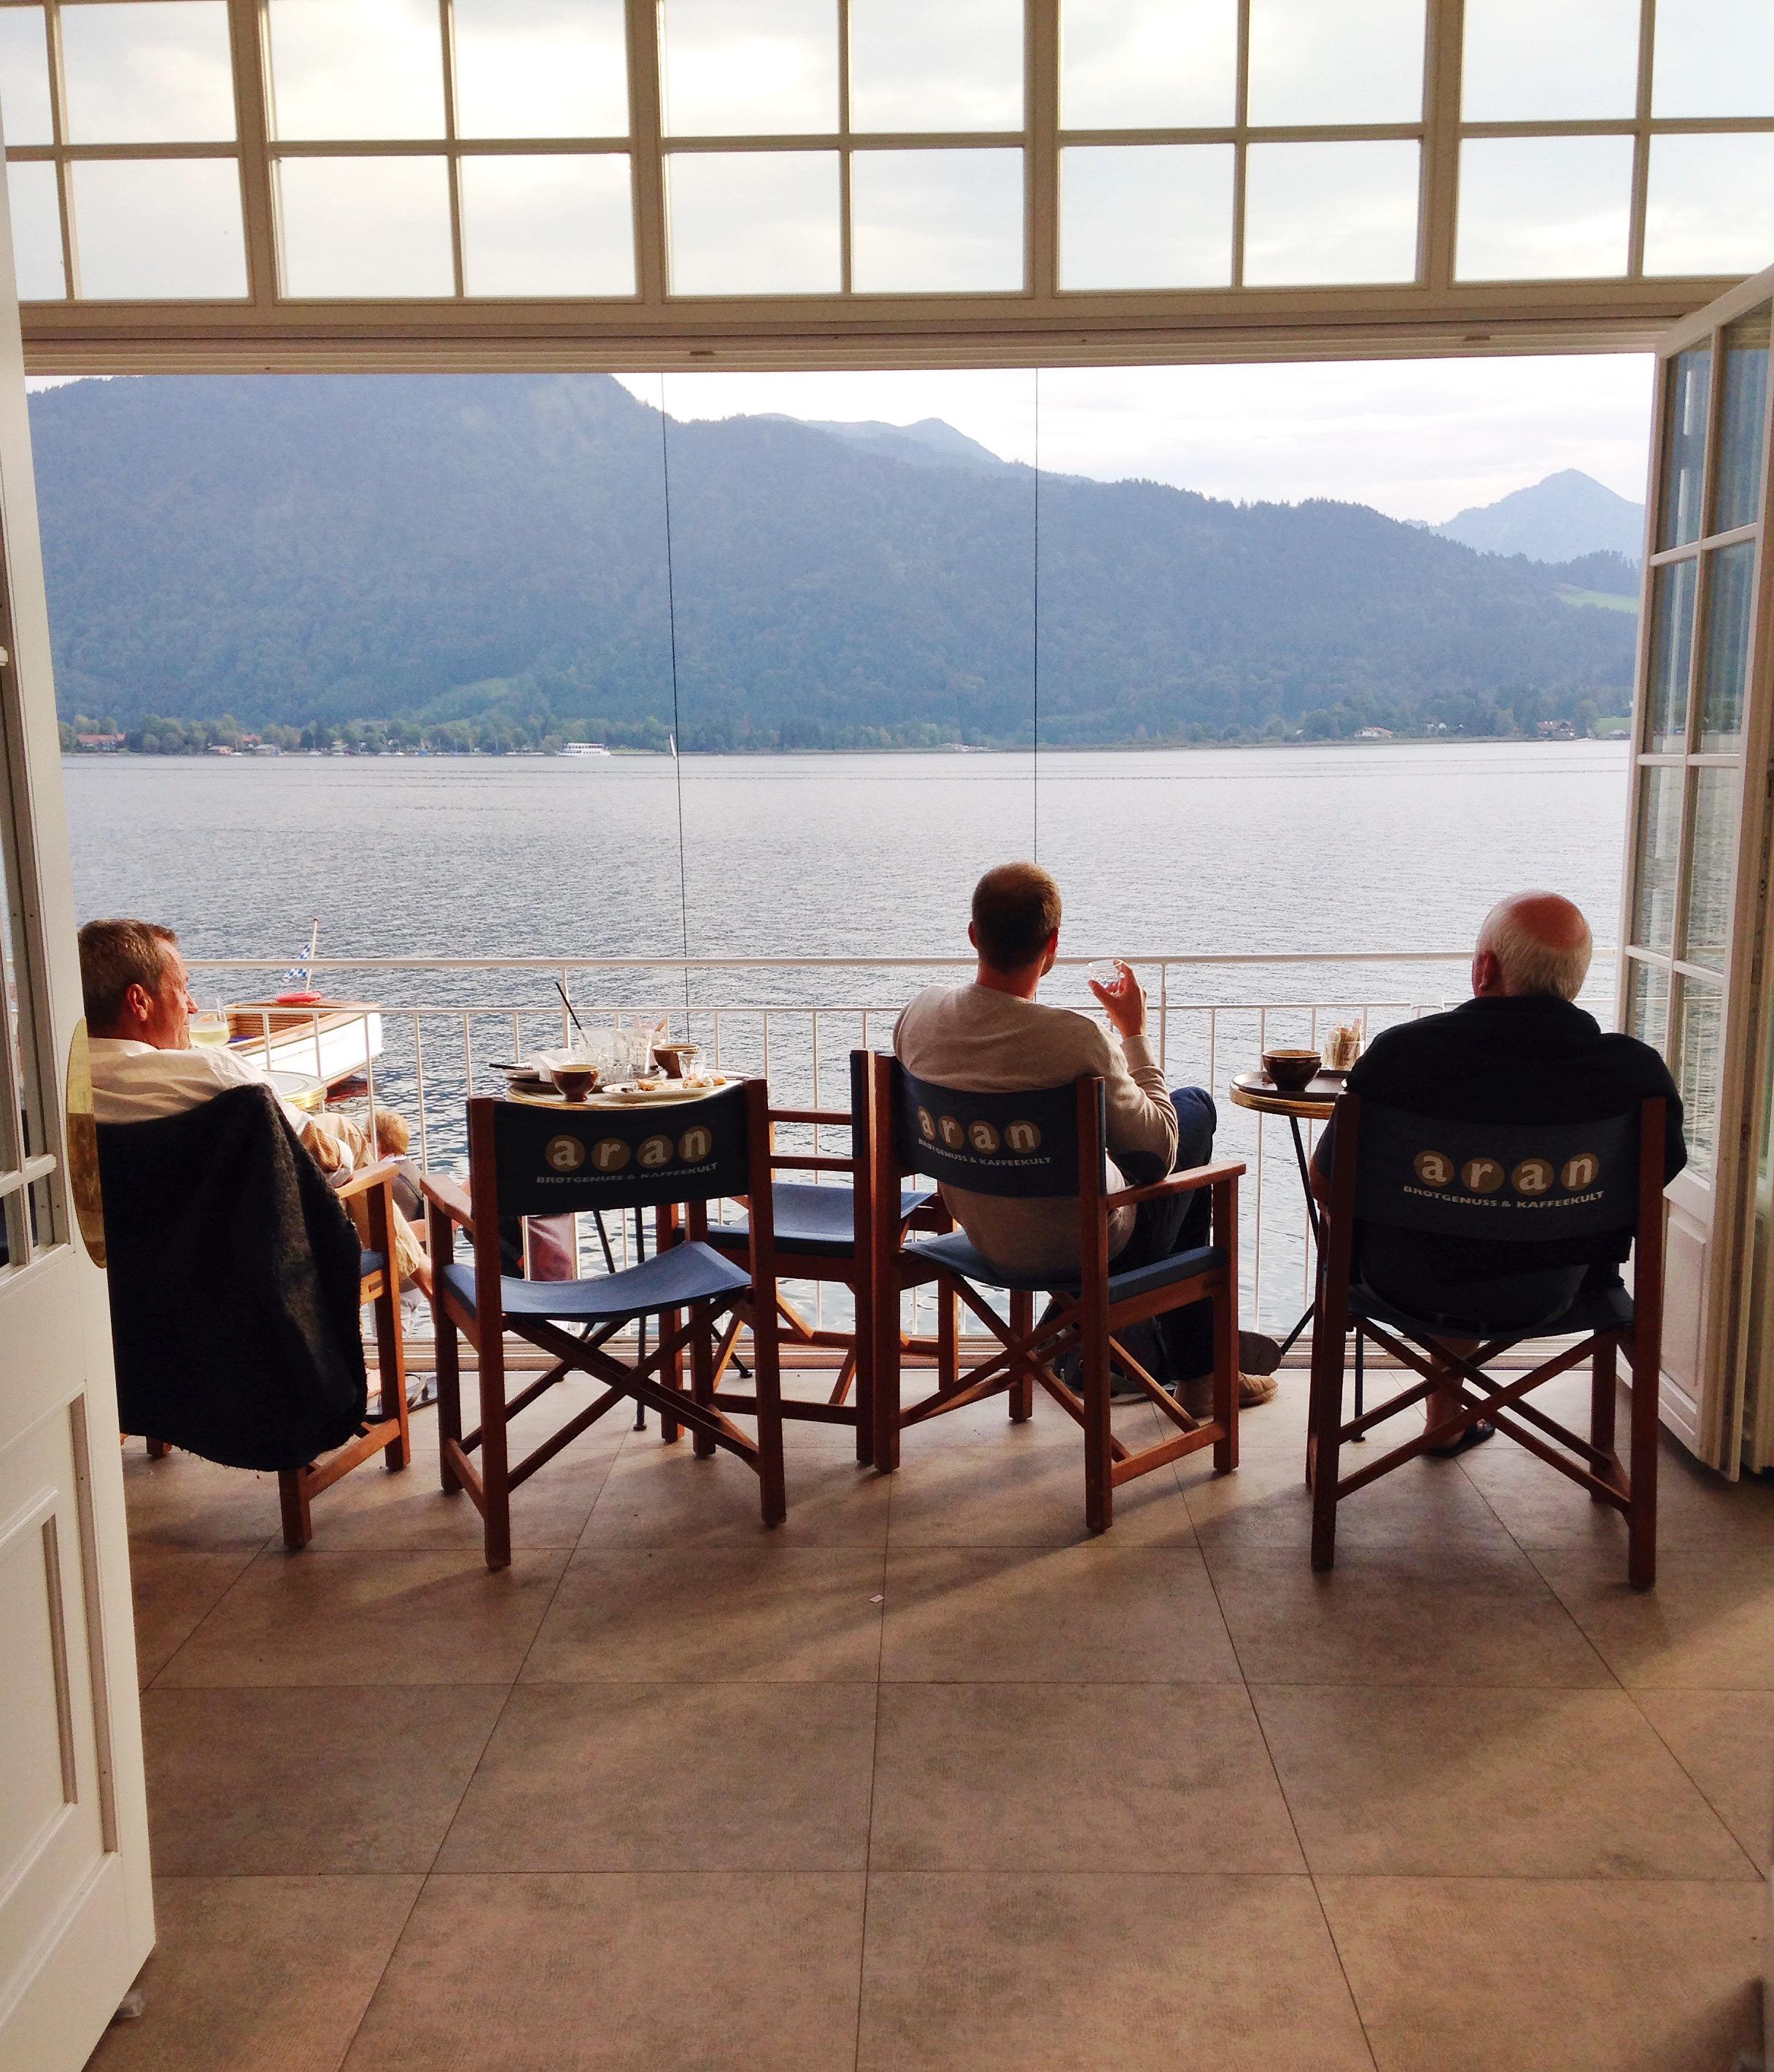 tegernsee-lake-bavaria-germany-travel-view-aran-cafe-annaporter